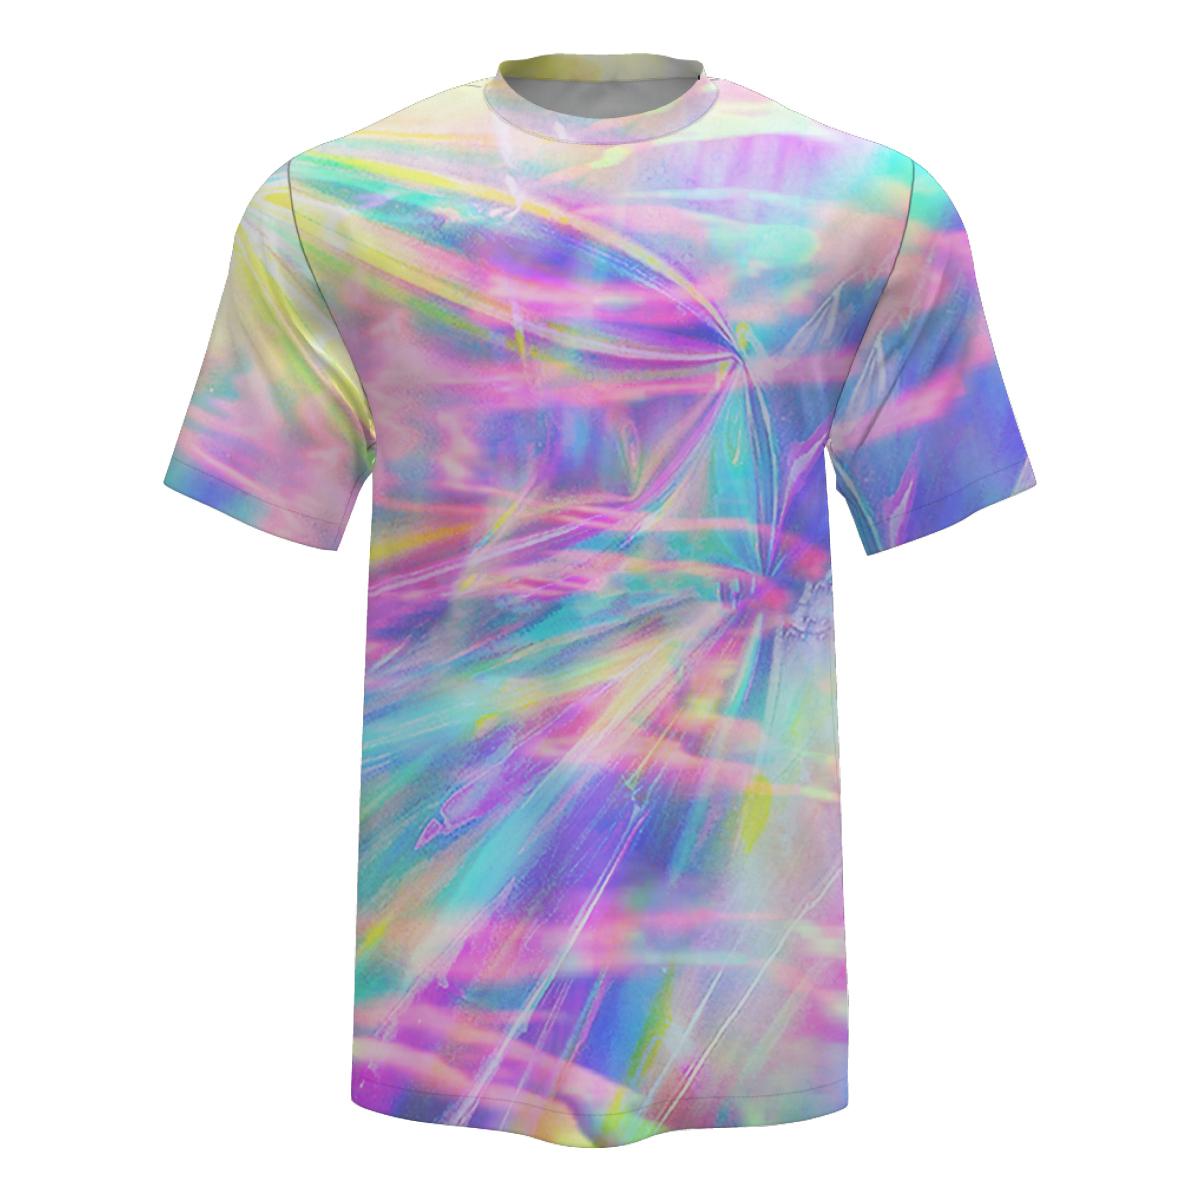 Reflective T-shirt